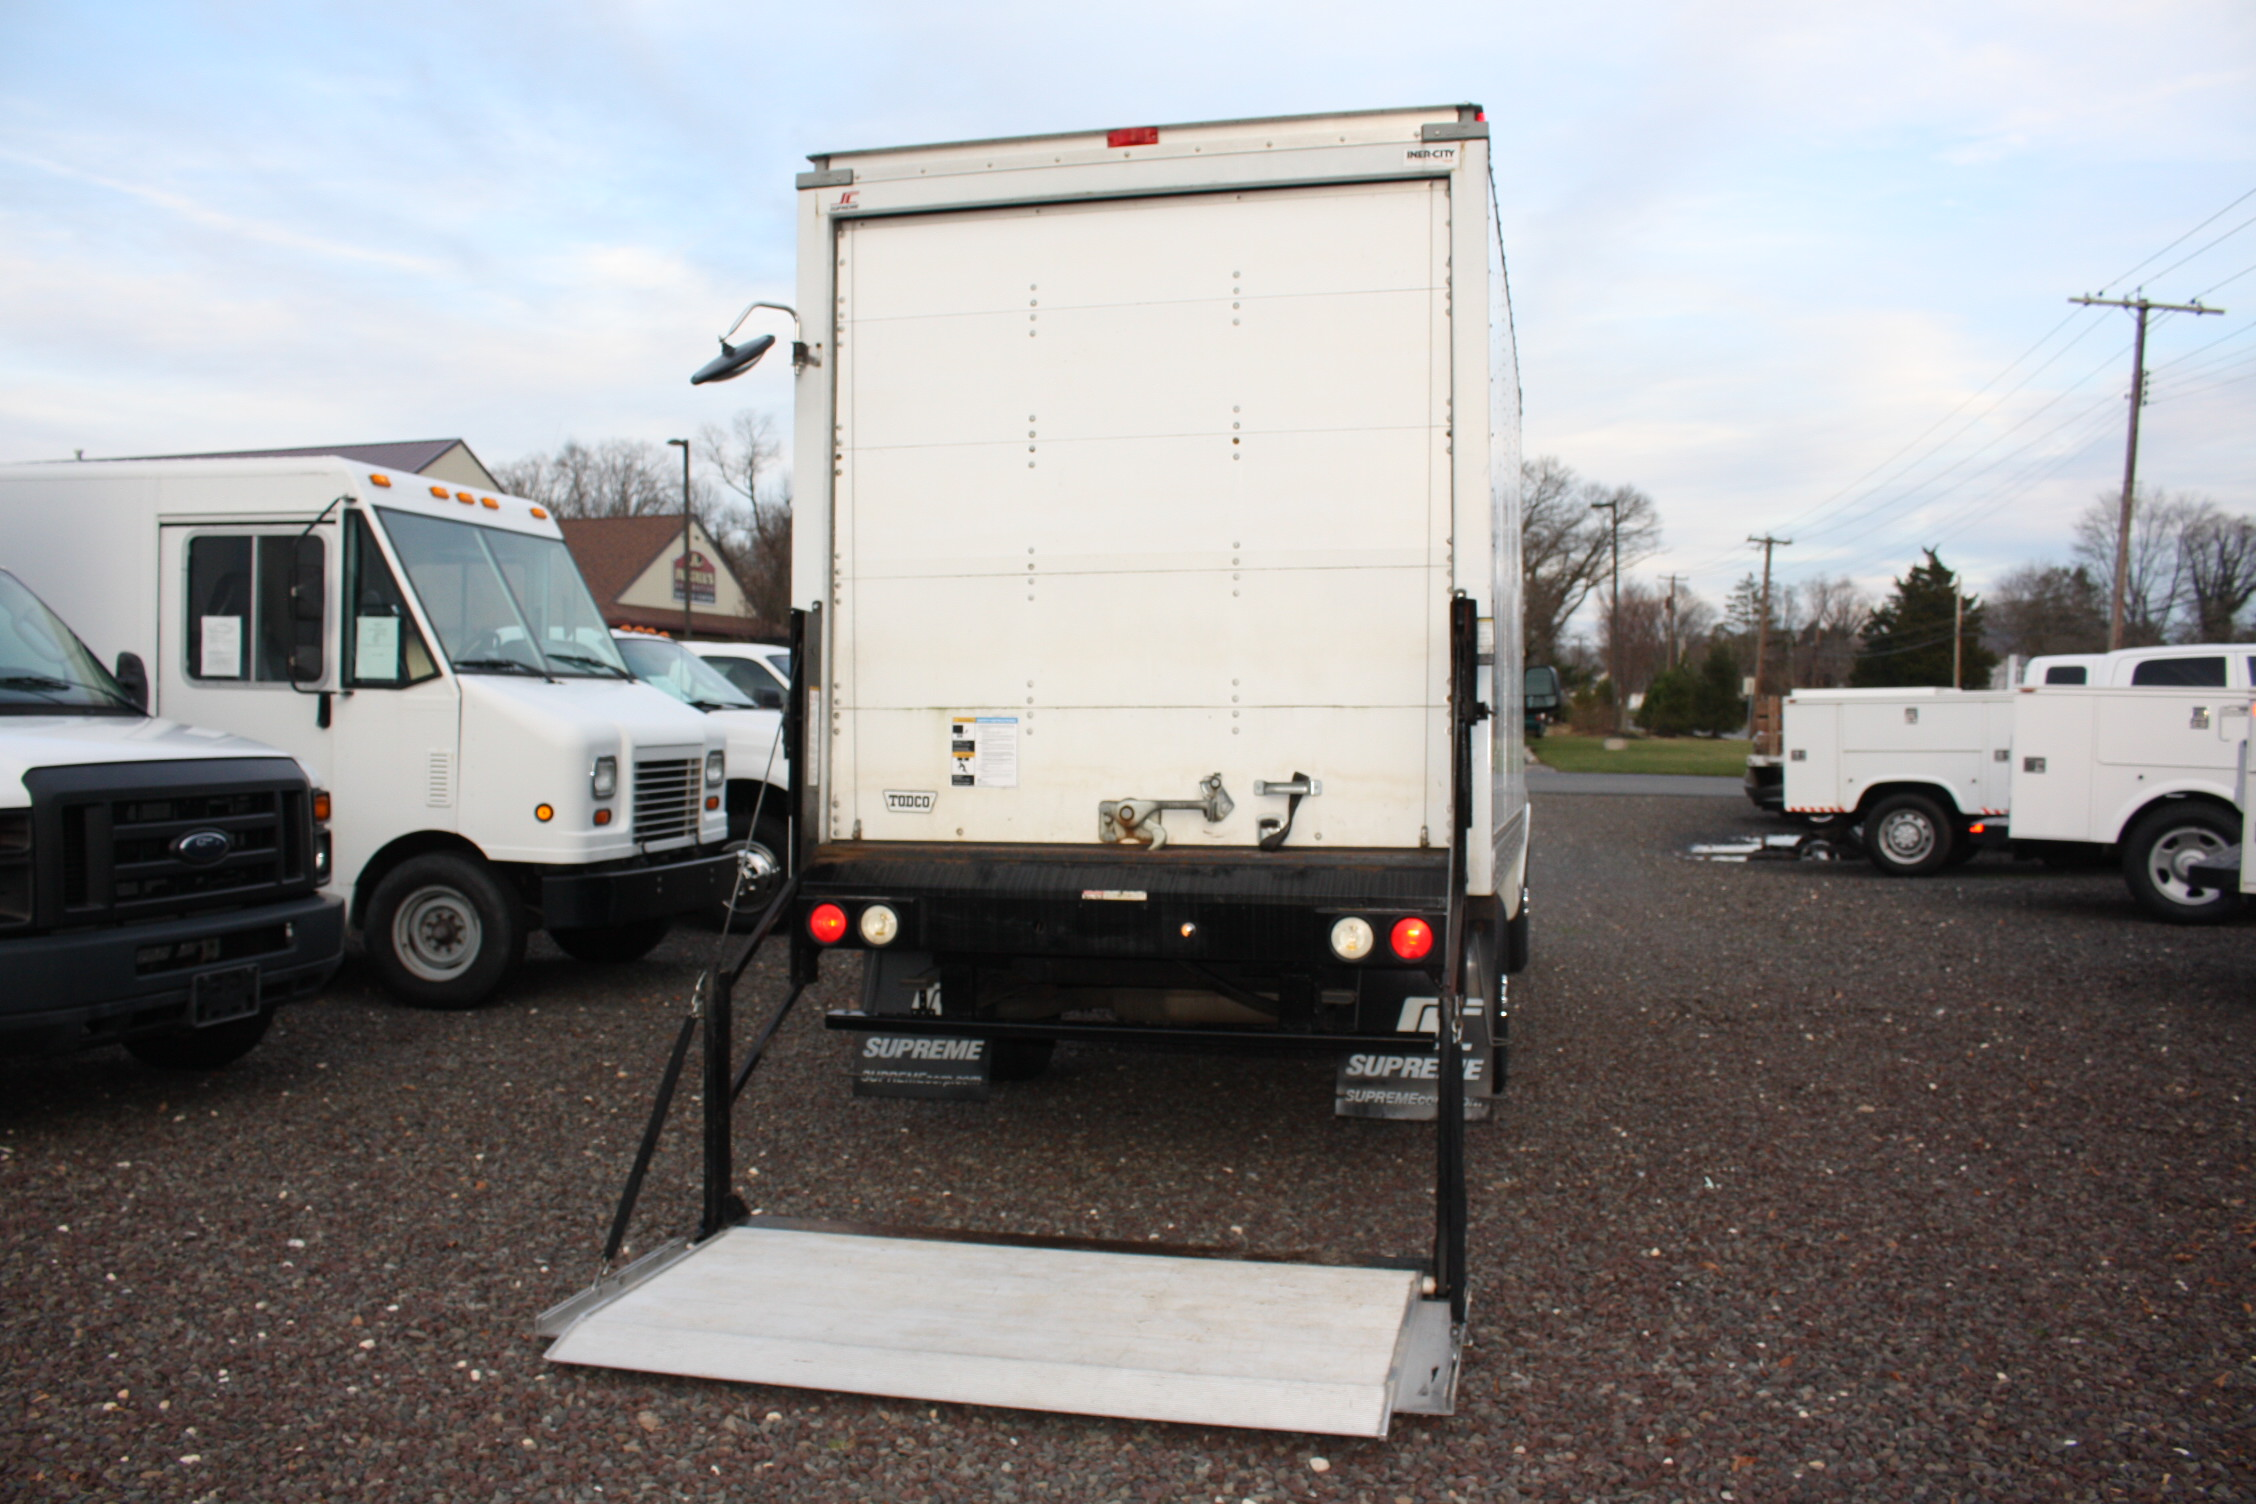 IMG 2535 - 2014 CHEVROLET G3500 BOX TRUCK